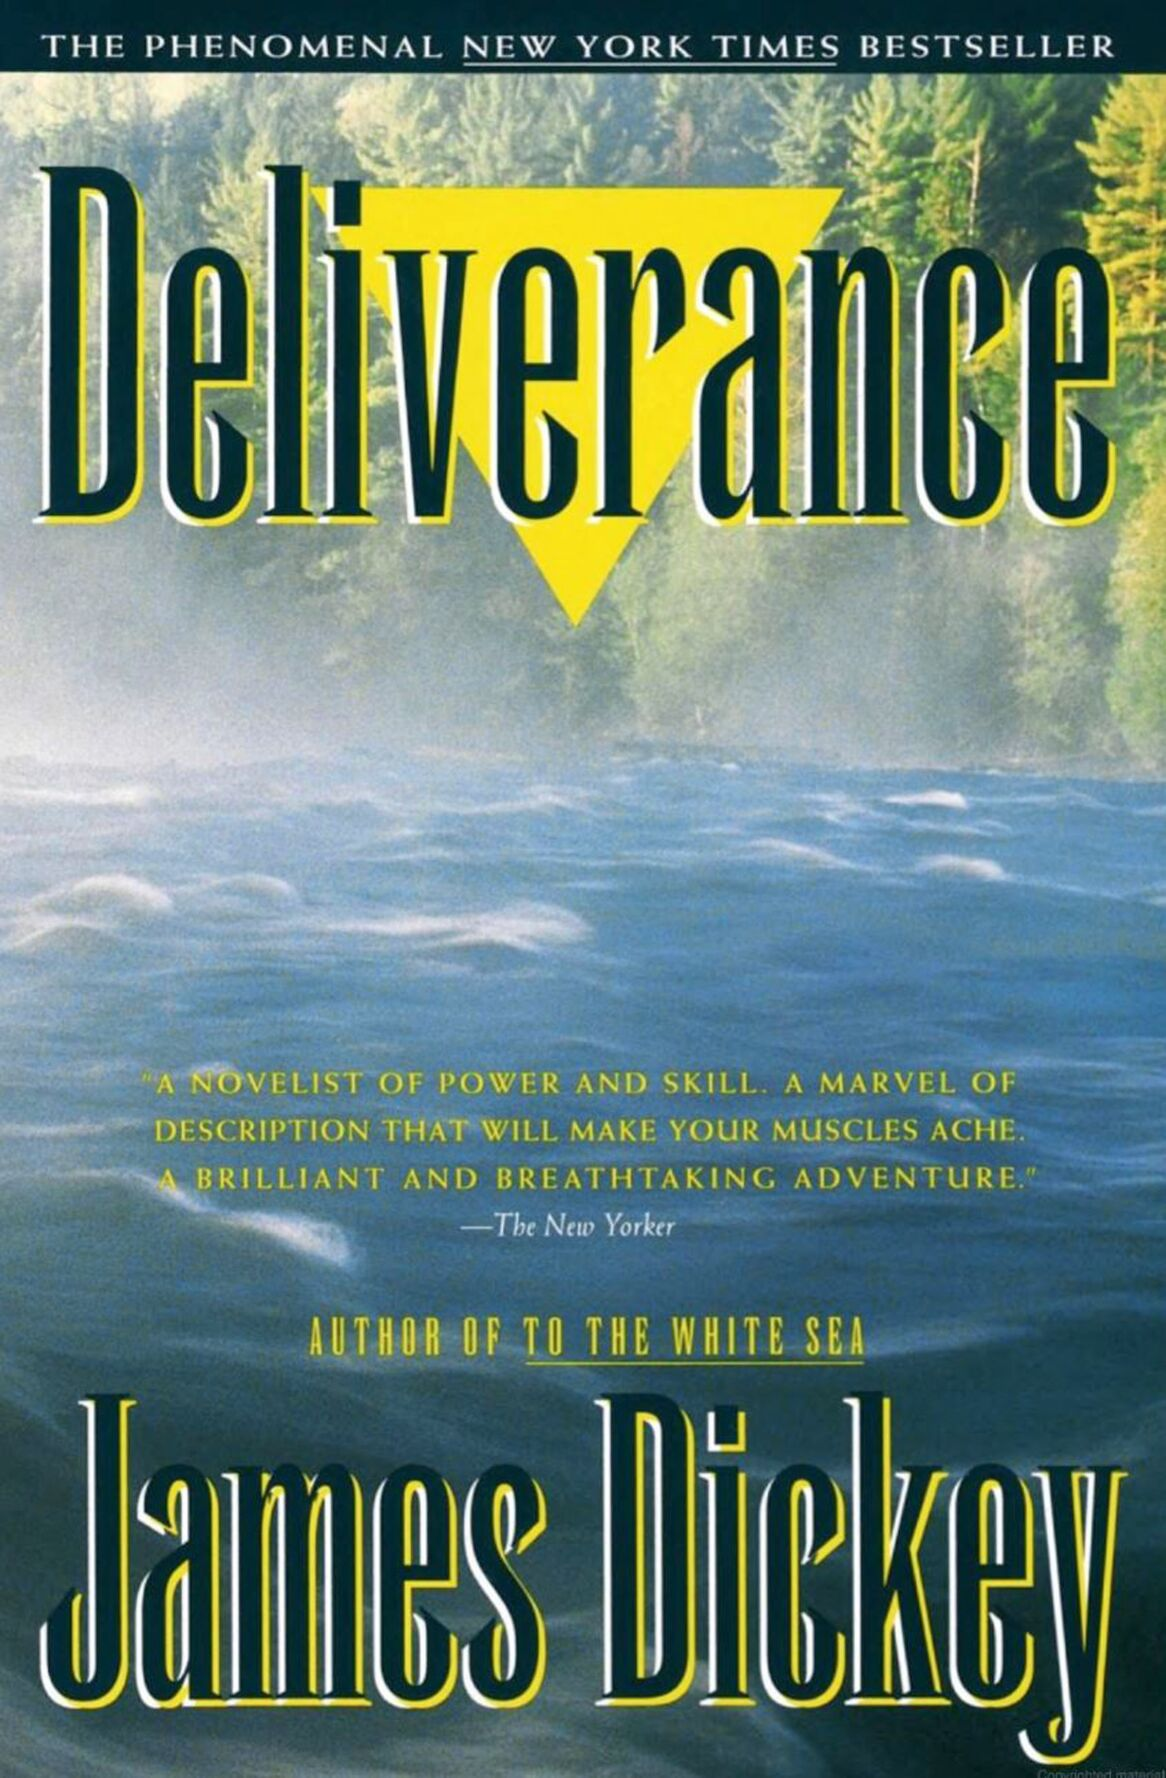 090920_MNS_Deliverance_cover Deliverance cover James Dickey